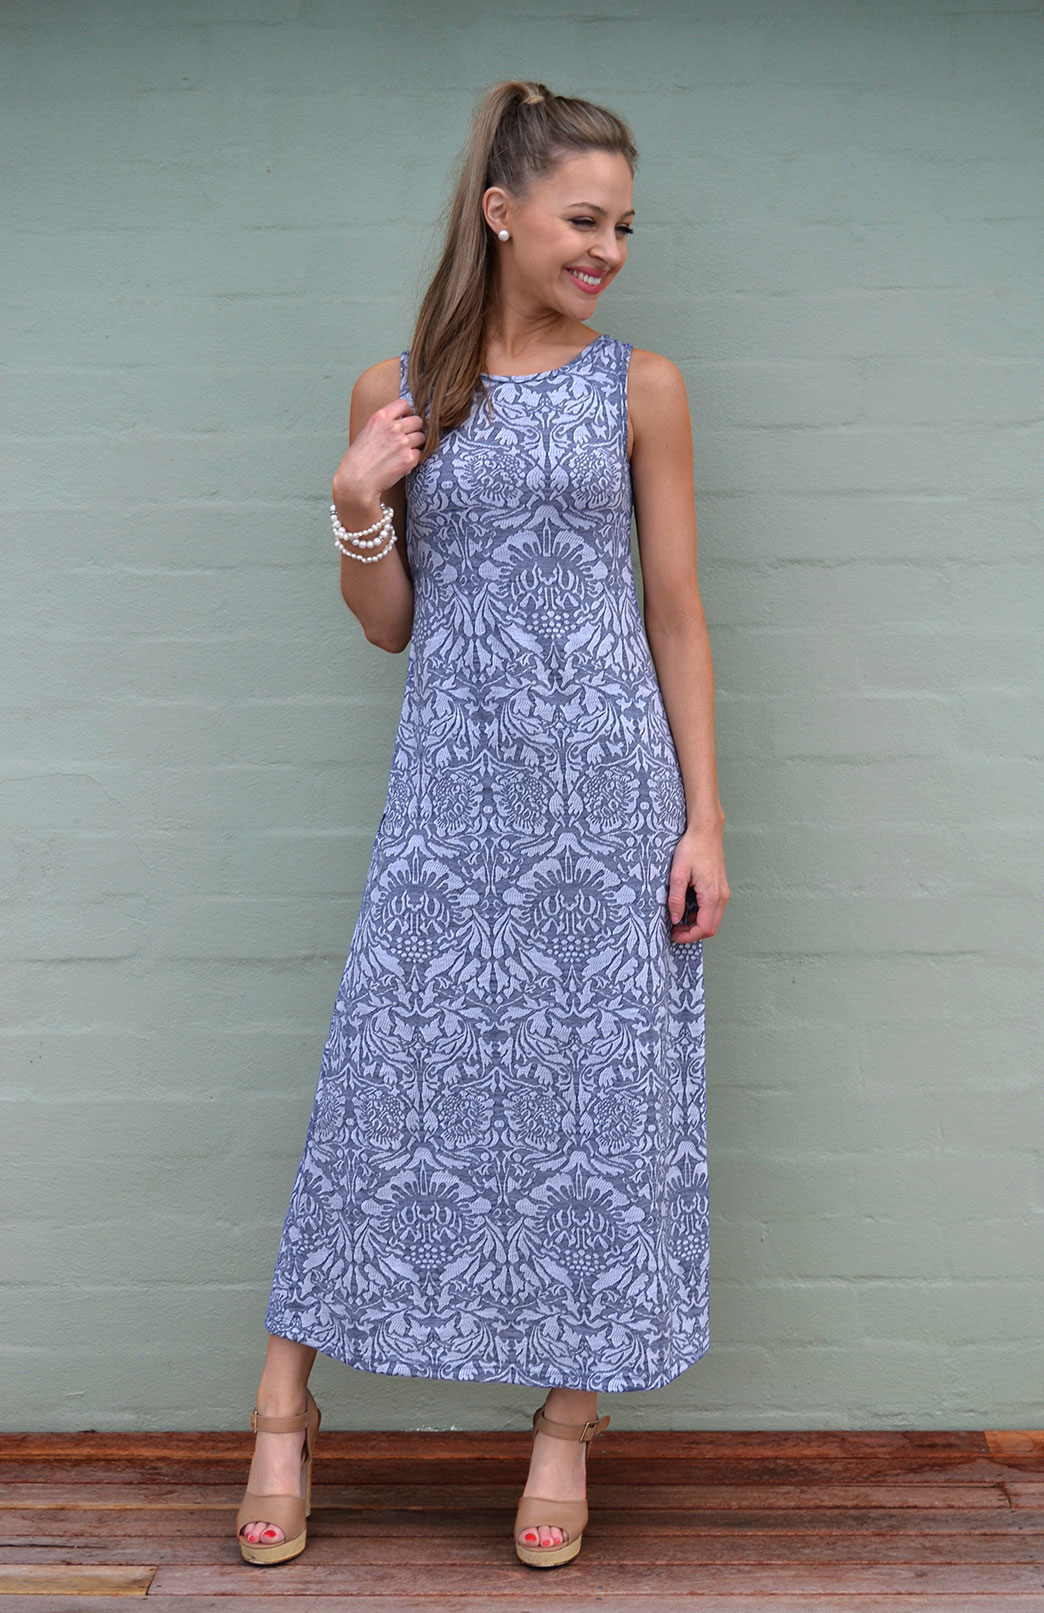 Boat Neck Maxi Dress - Pattern - Women's Blue & Grey Floral Long Wool Maxi Summer Dress - Smitten Merino Tasmania Australia